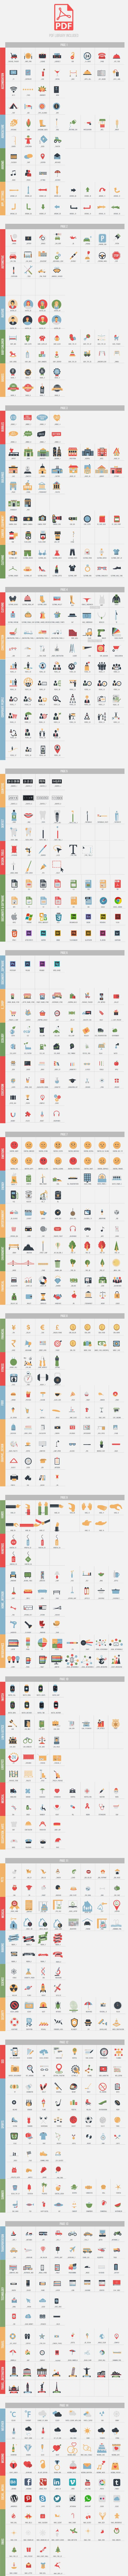 Explainer World Essential Graphics | Mogrt - 26